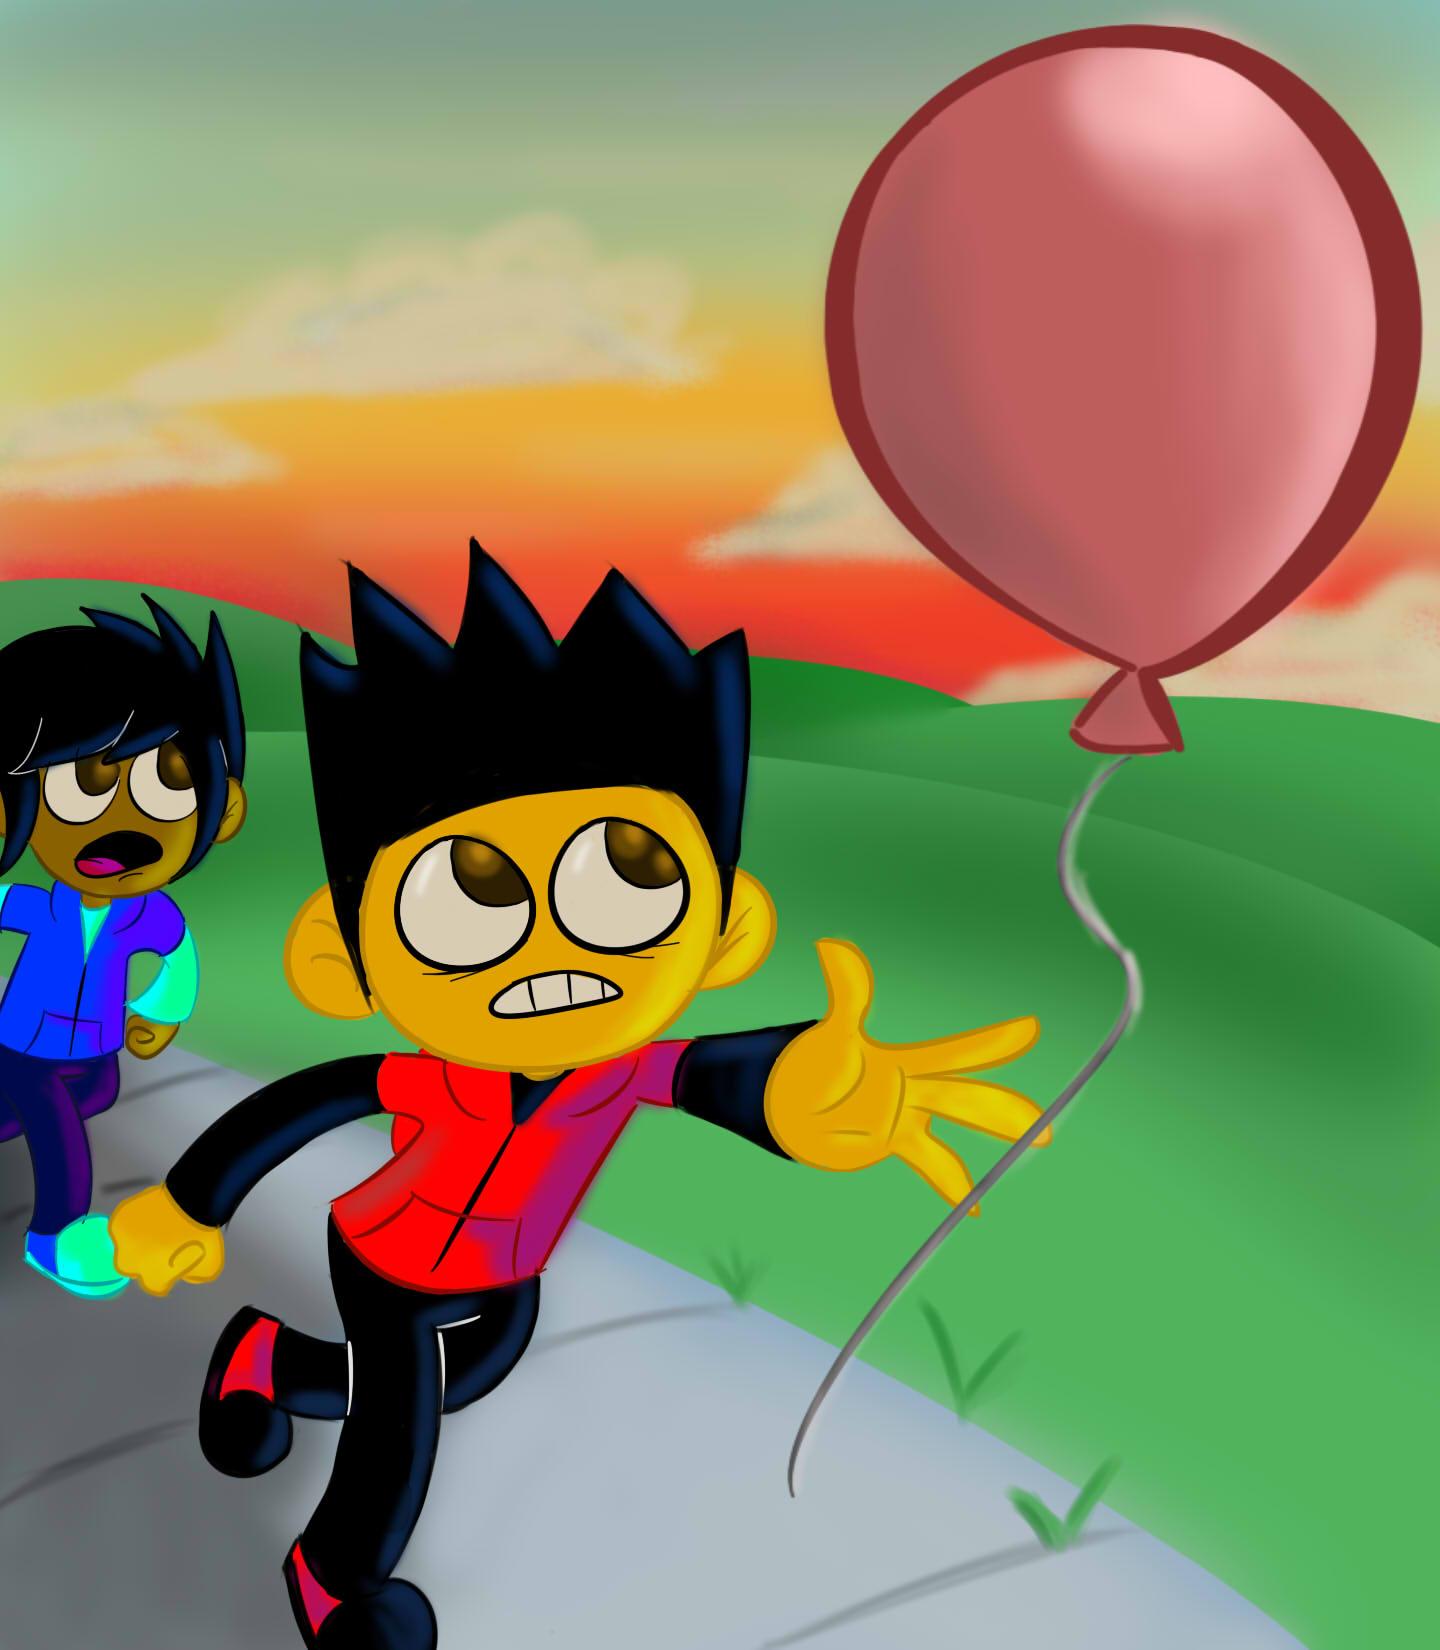 Dang balloons